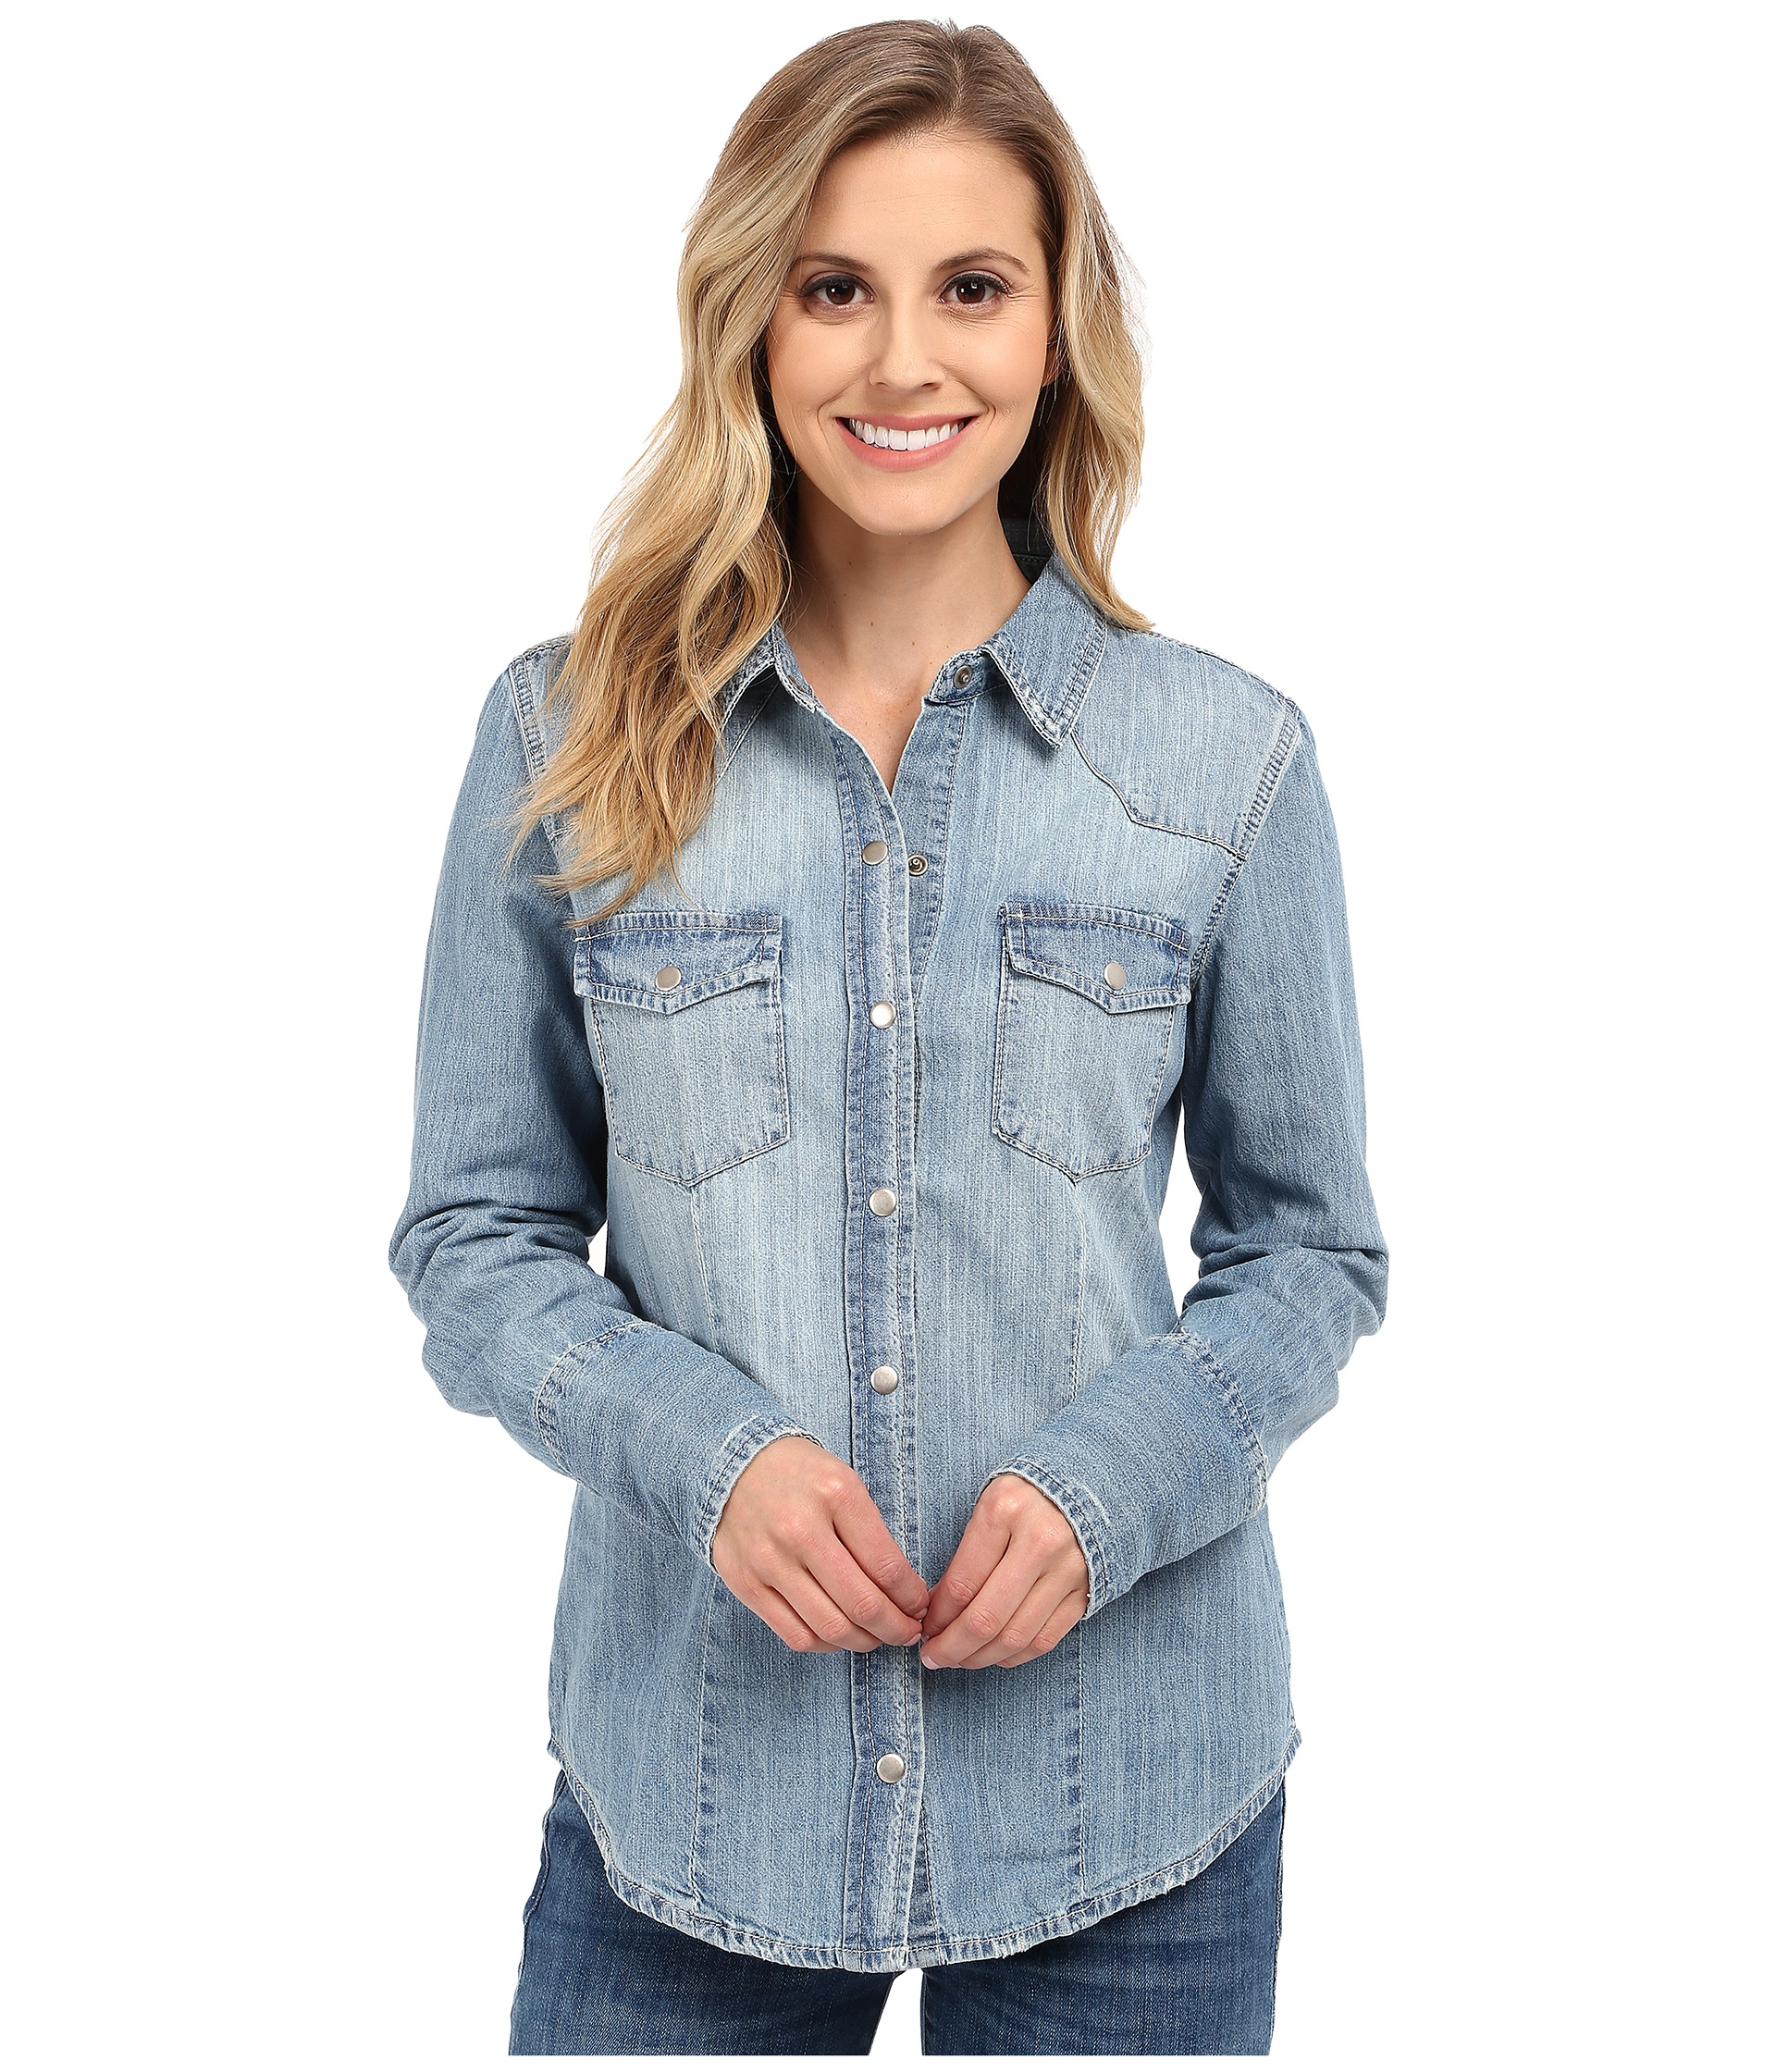 0ee52859 Stetson Light Blue Denim Long Sleeve Western Shirt in Blue - Lyst